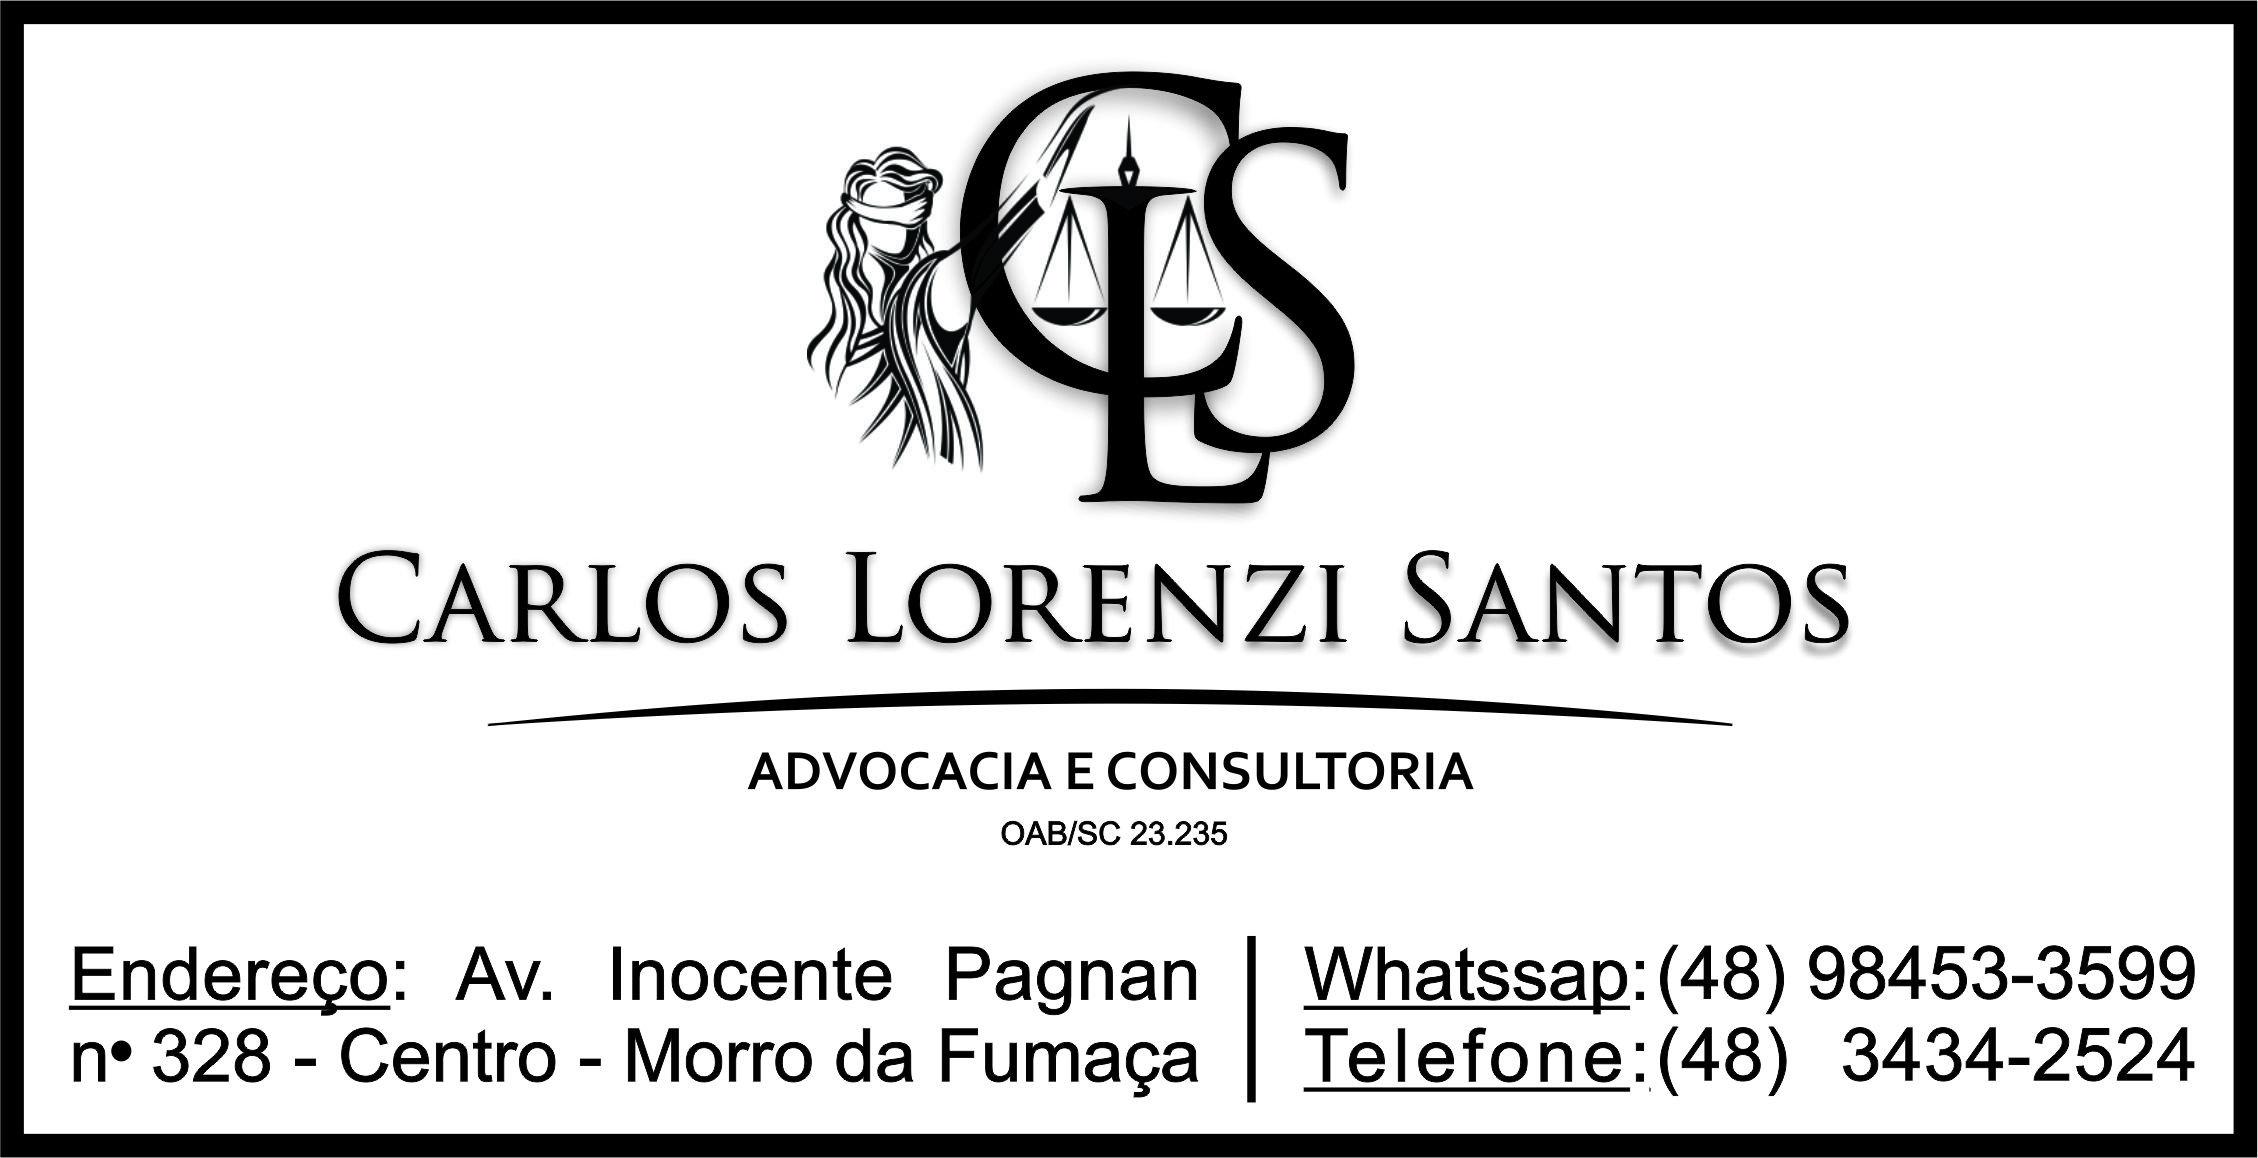 Carlos Lorenzi Santos Advocacia e Consultoria